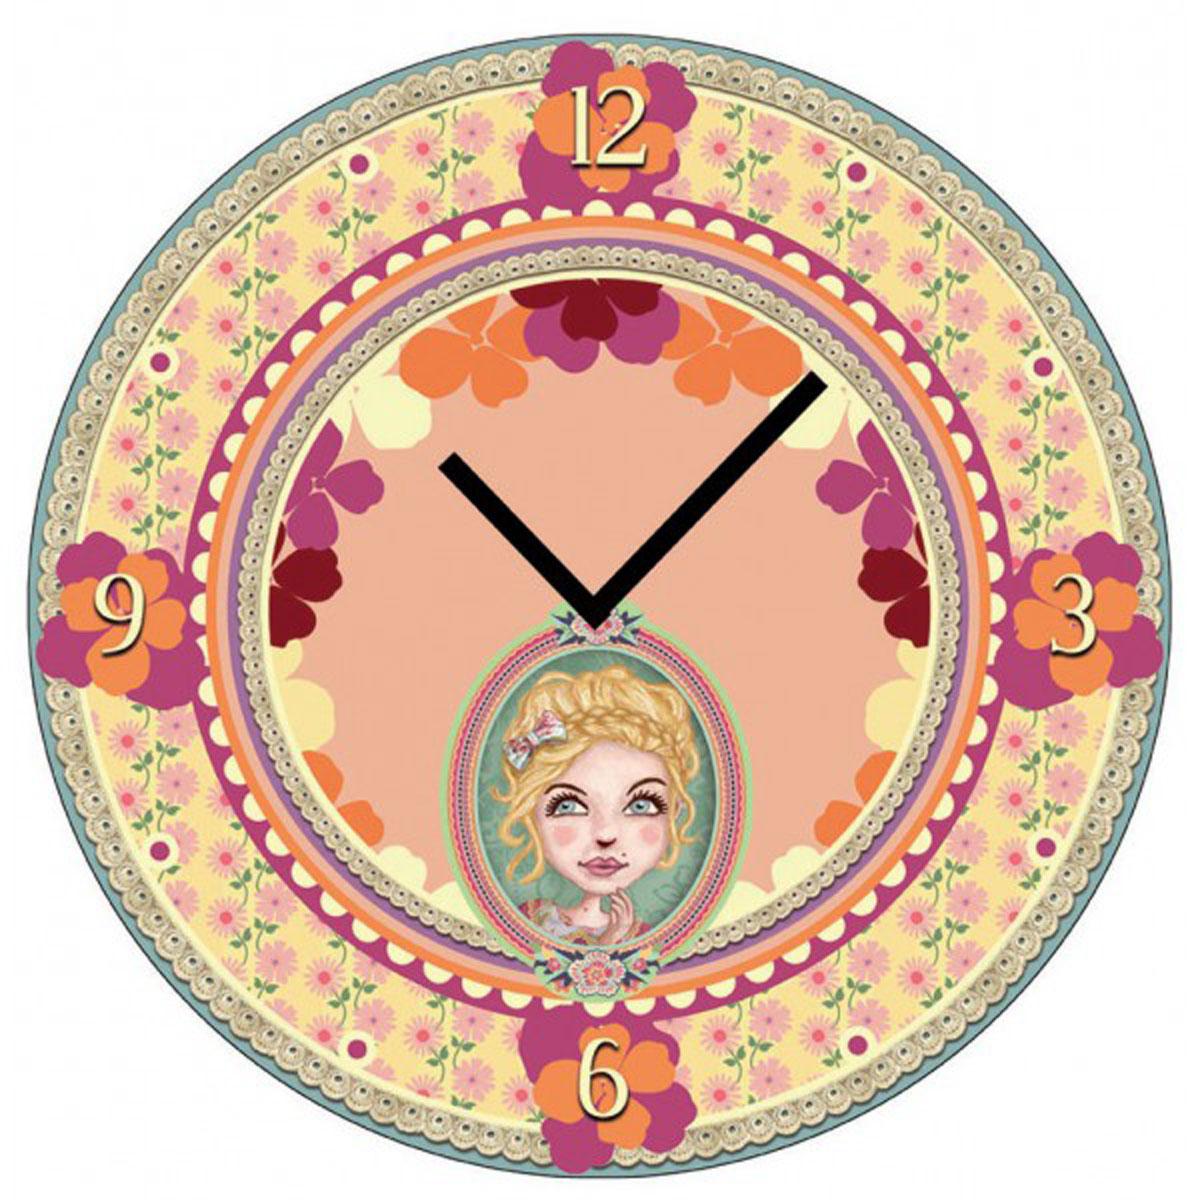 Horloge Murale verre \'Lili Petrol\' beige rose (Chloé) - 30 cm - [M3394]